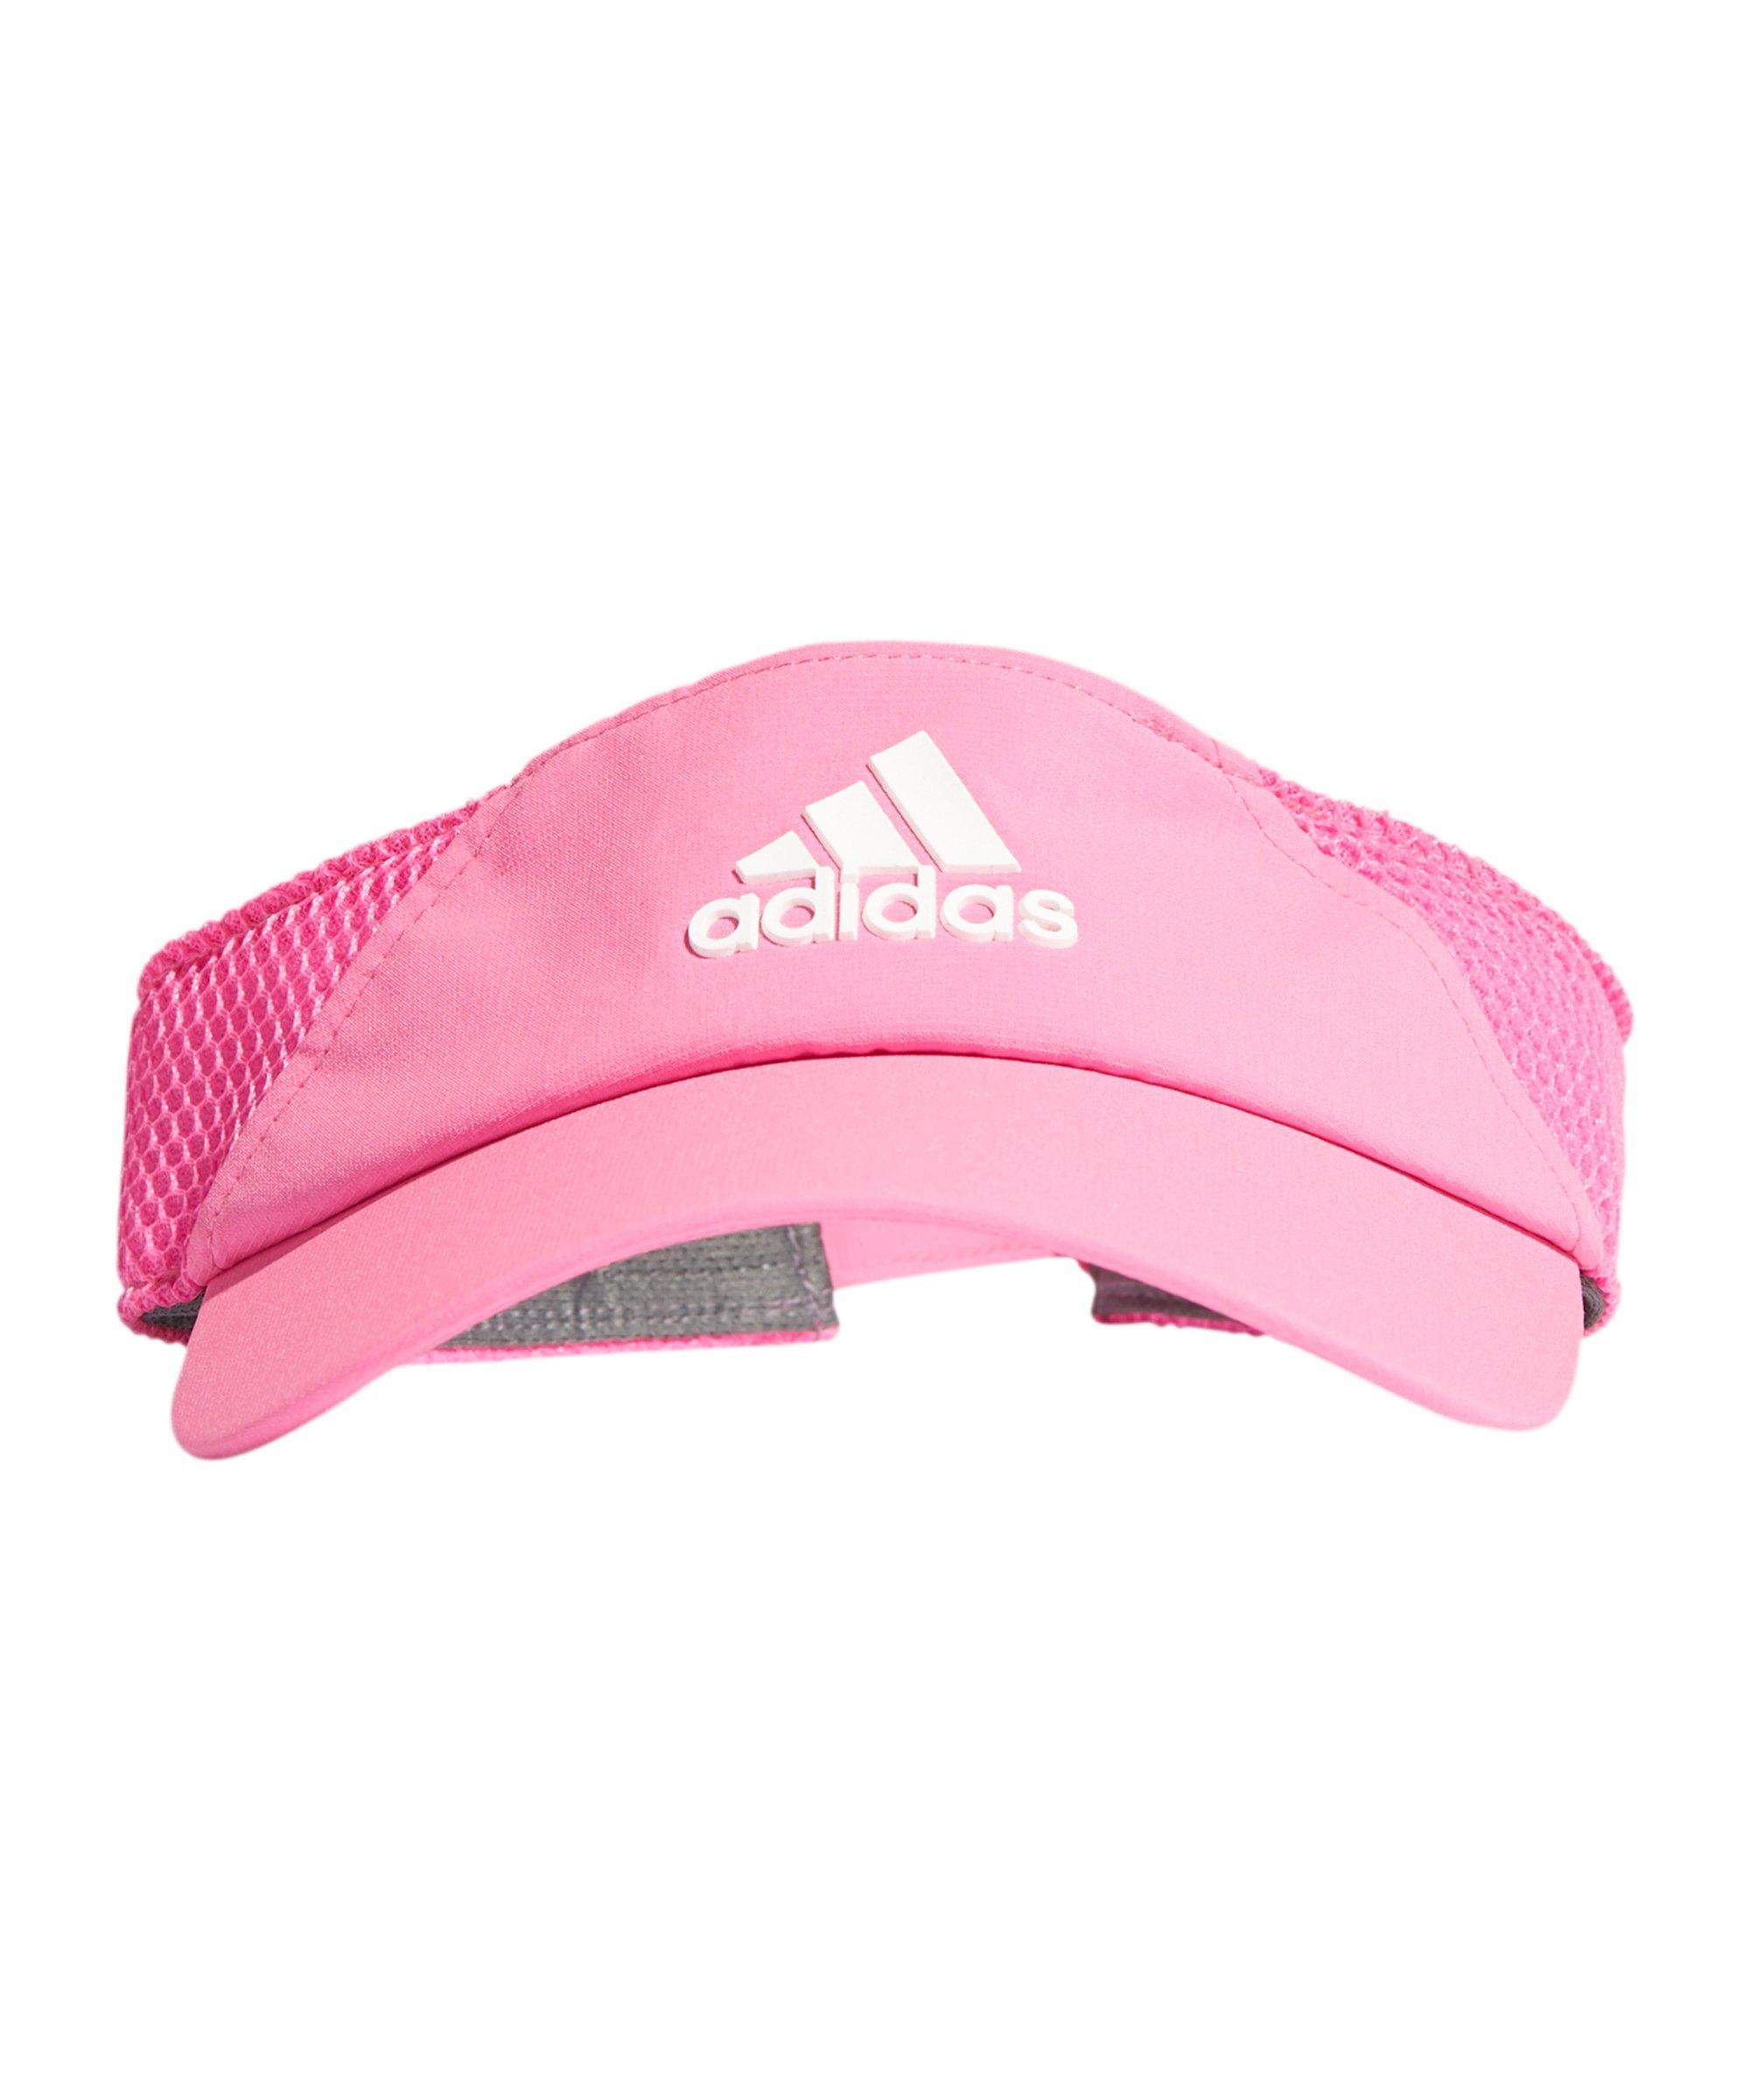 adidas Aeroready Tennis Visor Cap Pink Weiss - pink